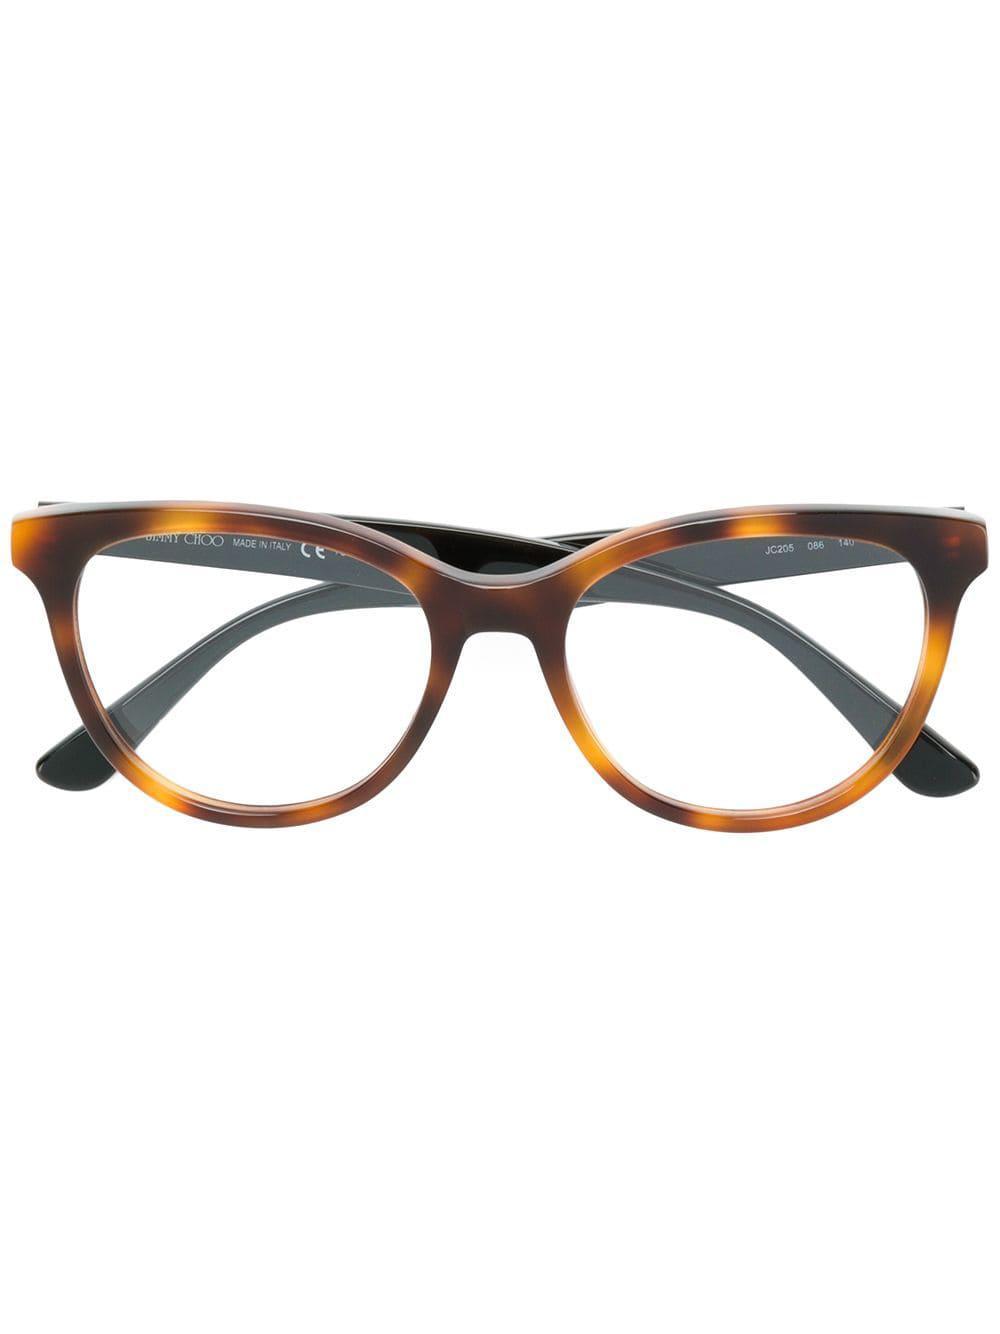 86e95f9661 Lyst - Jimmy Choo Round Frame Glasses in Brown